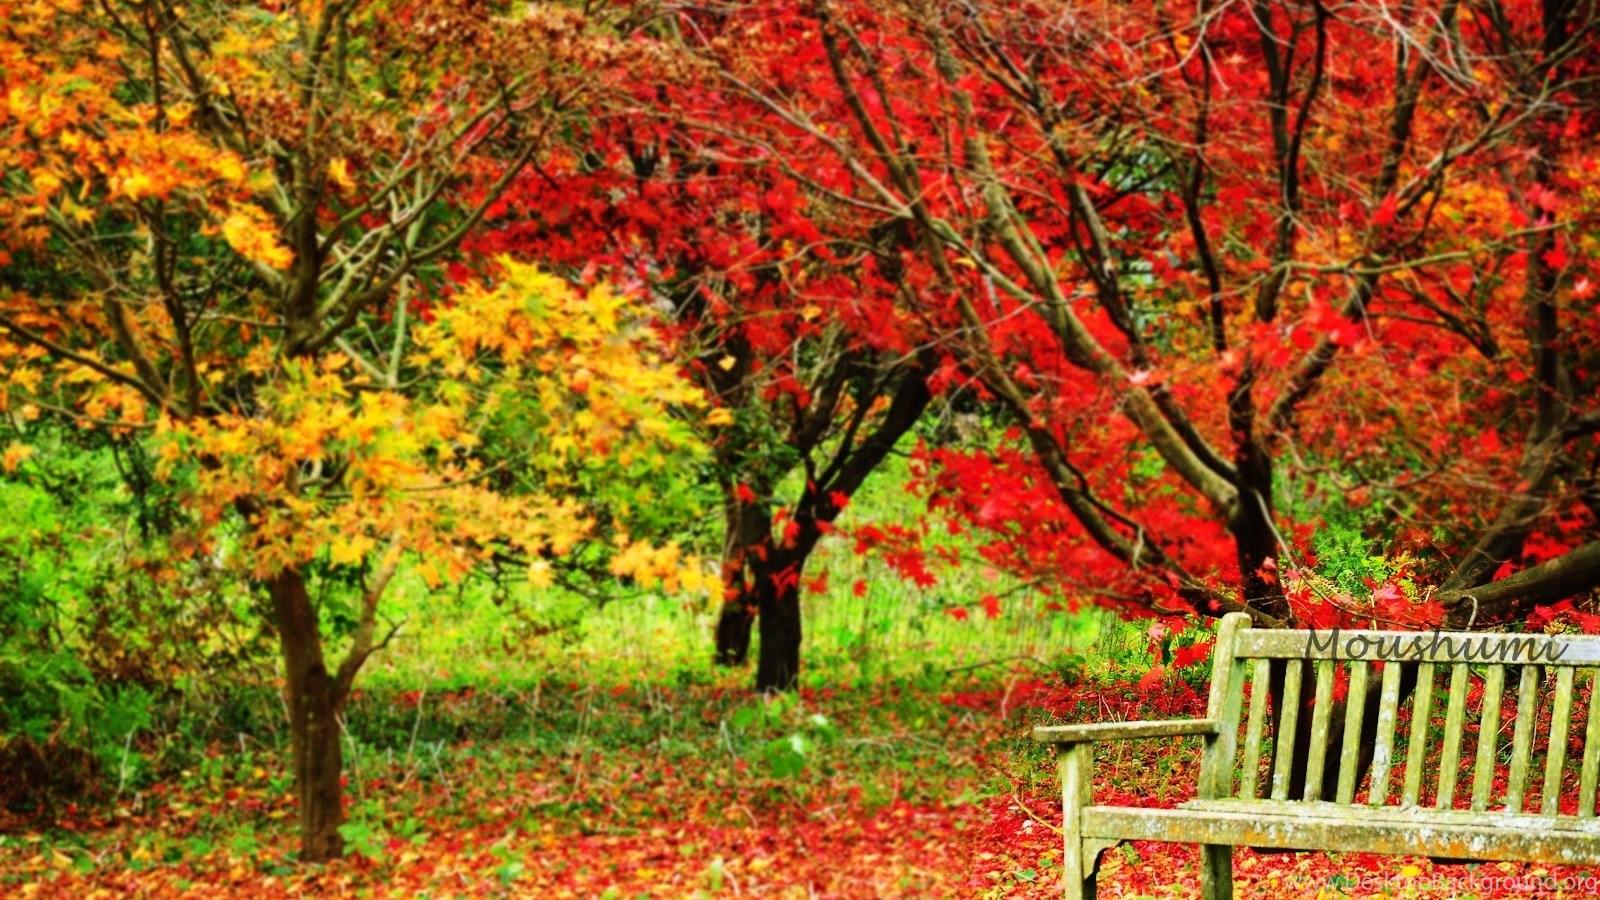 Autumn November Wallpapers Full Picture Desktop Background